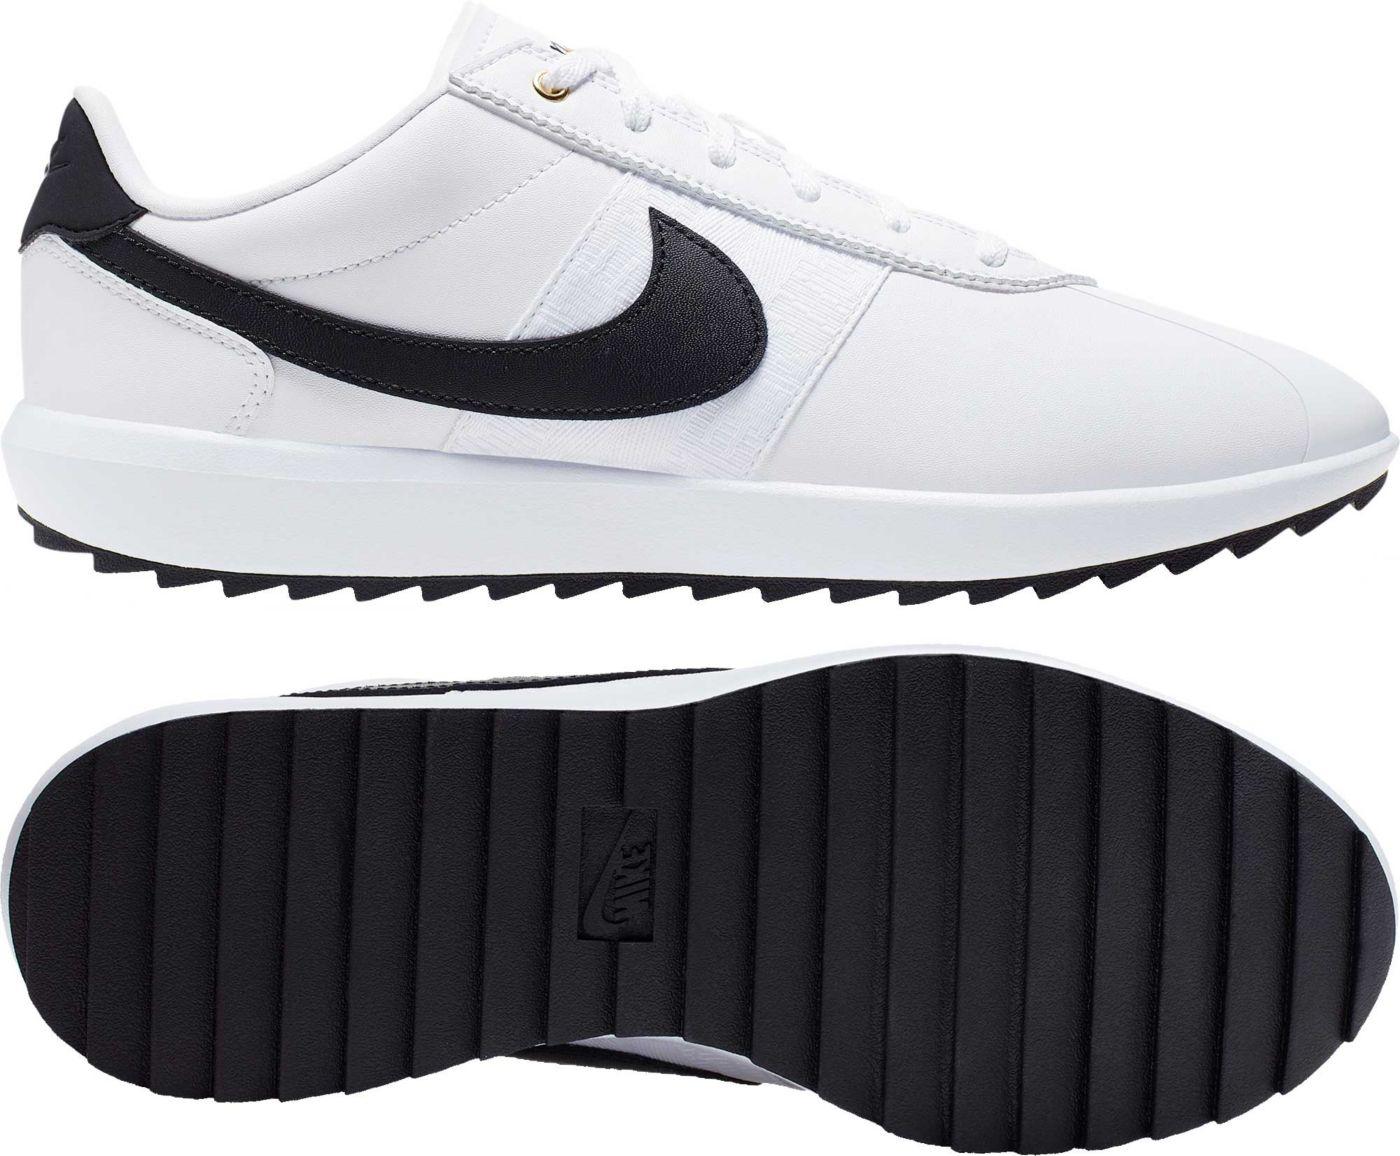 Nike Women's Cortez G Golf Shoes